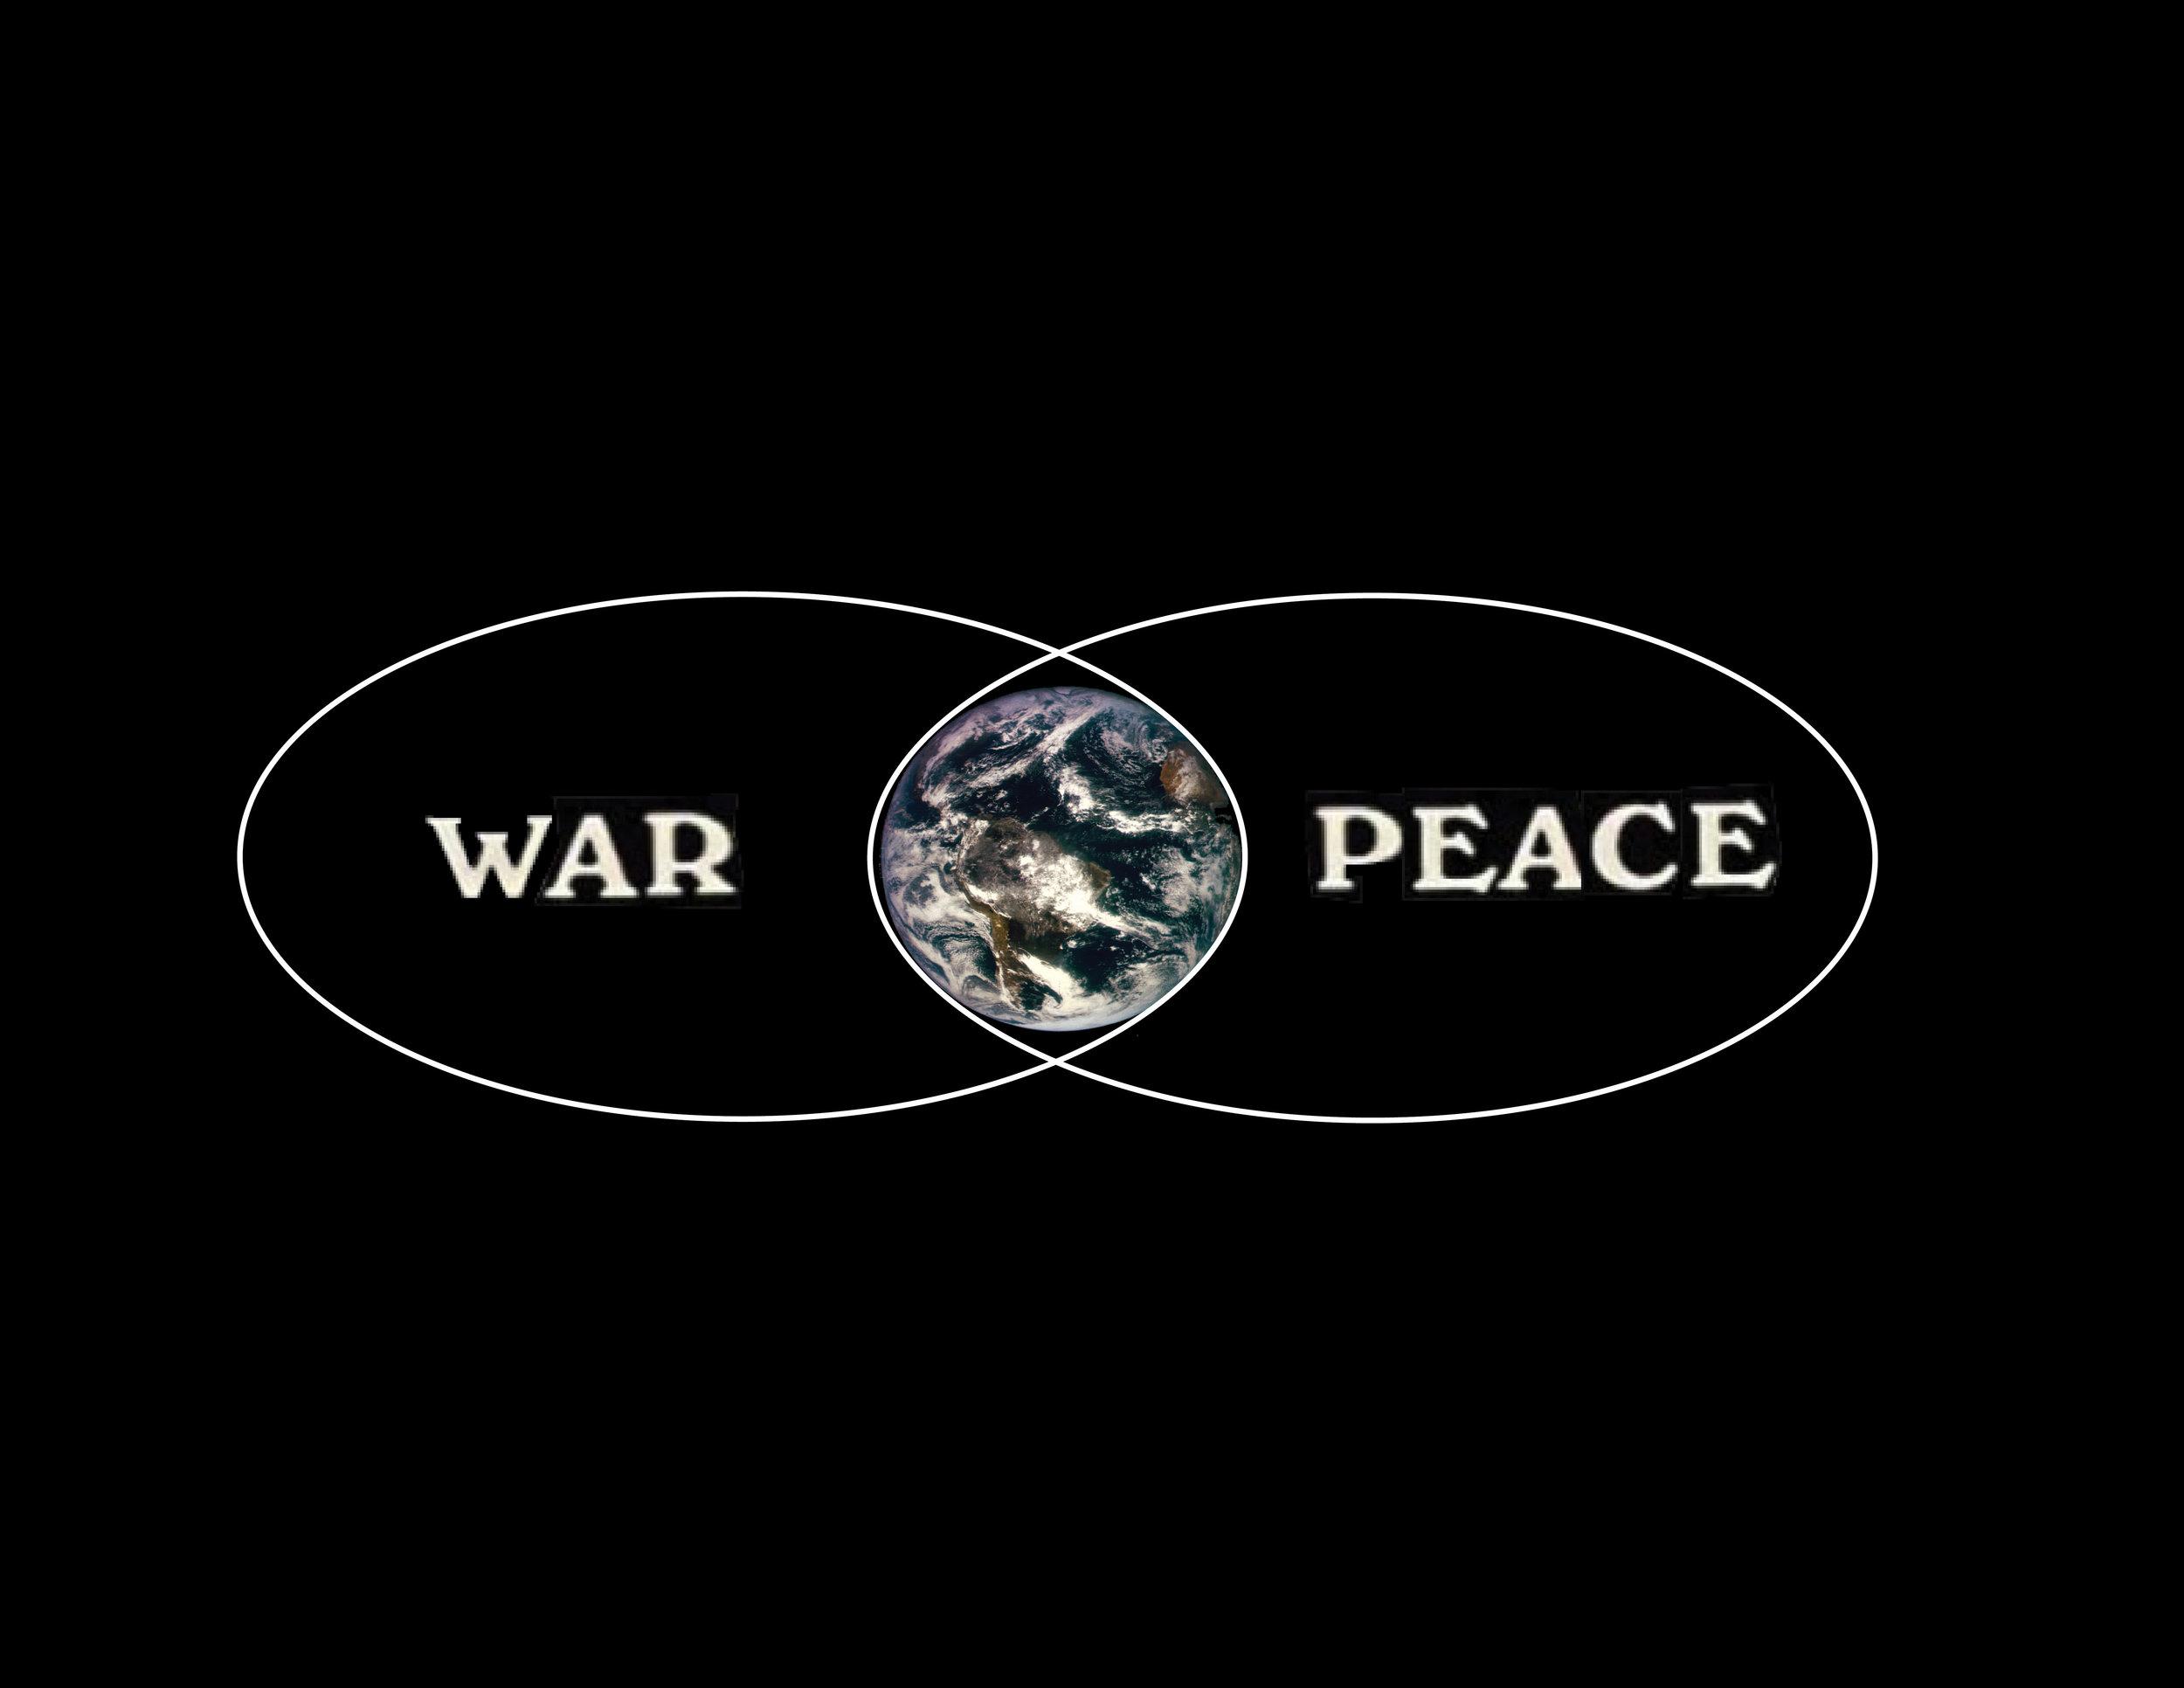 WAR WORLD PEACE VENN DIAGRAM